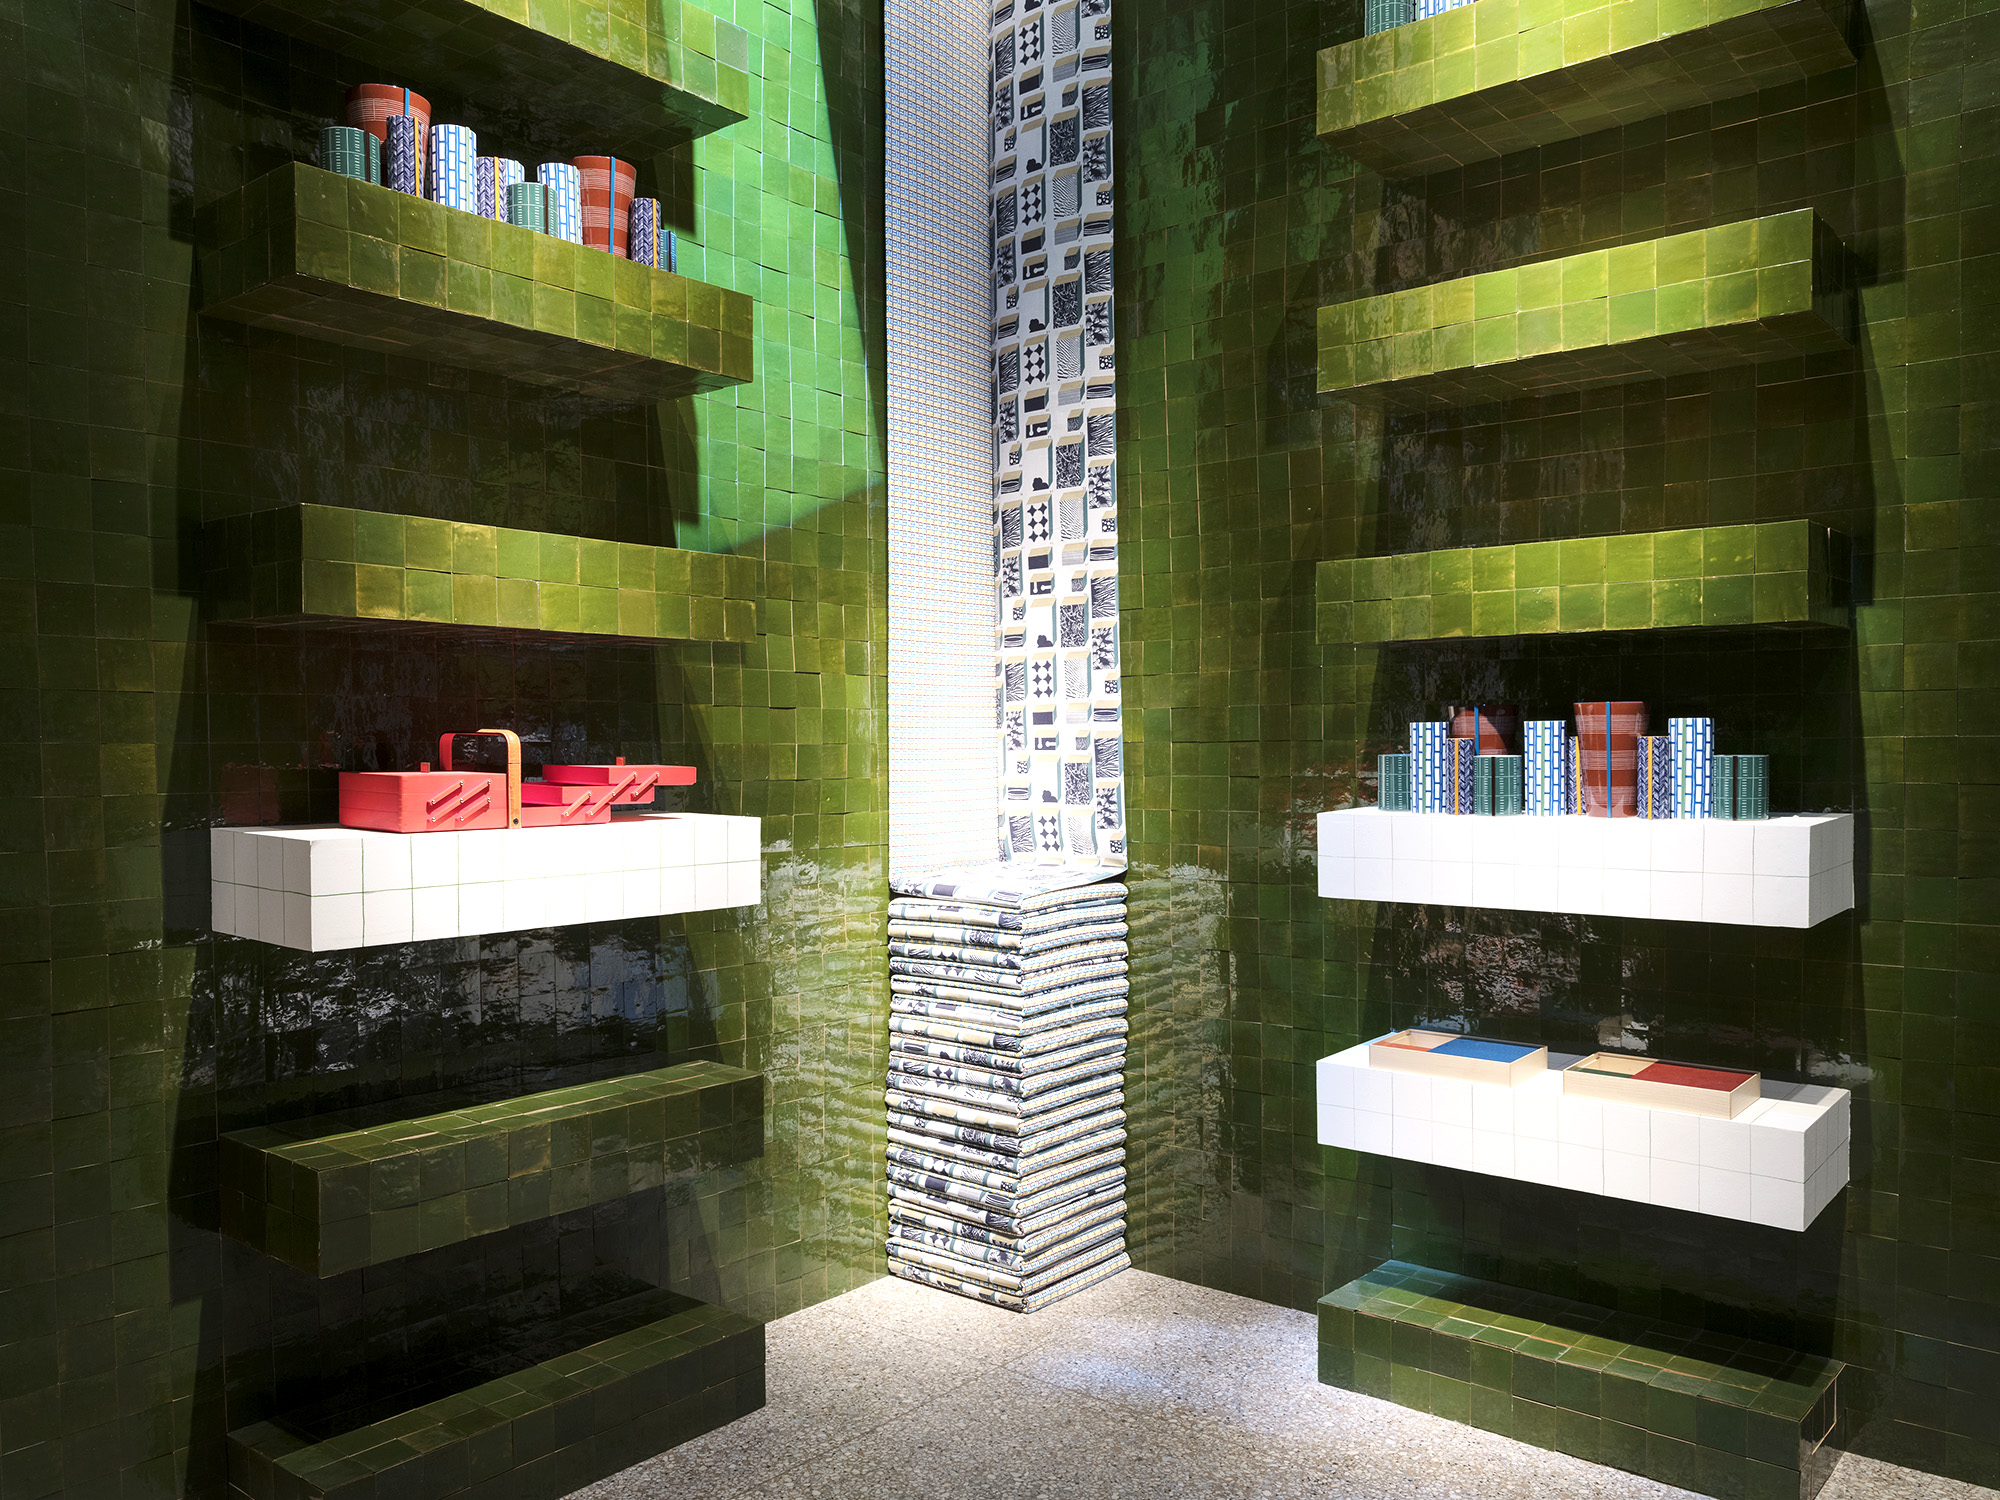 pavillon-hermes-2018-image7